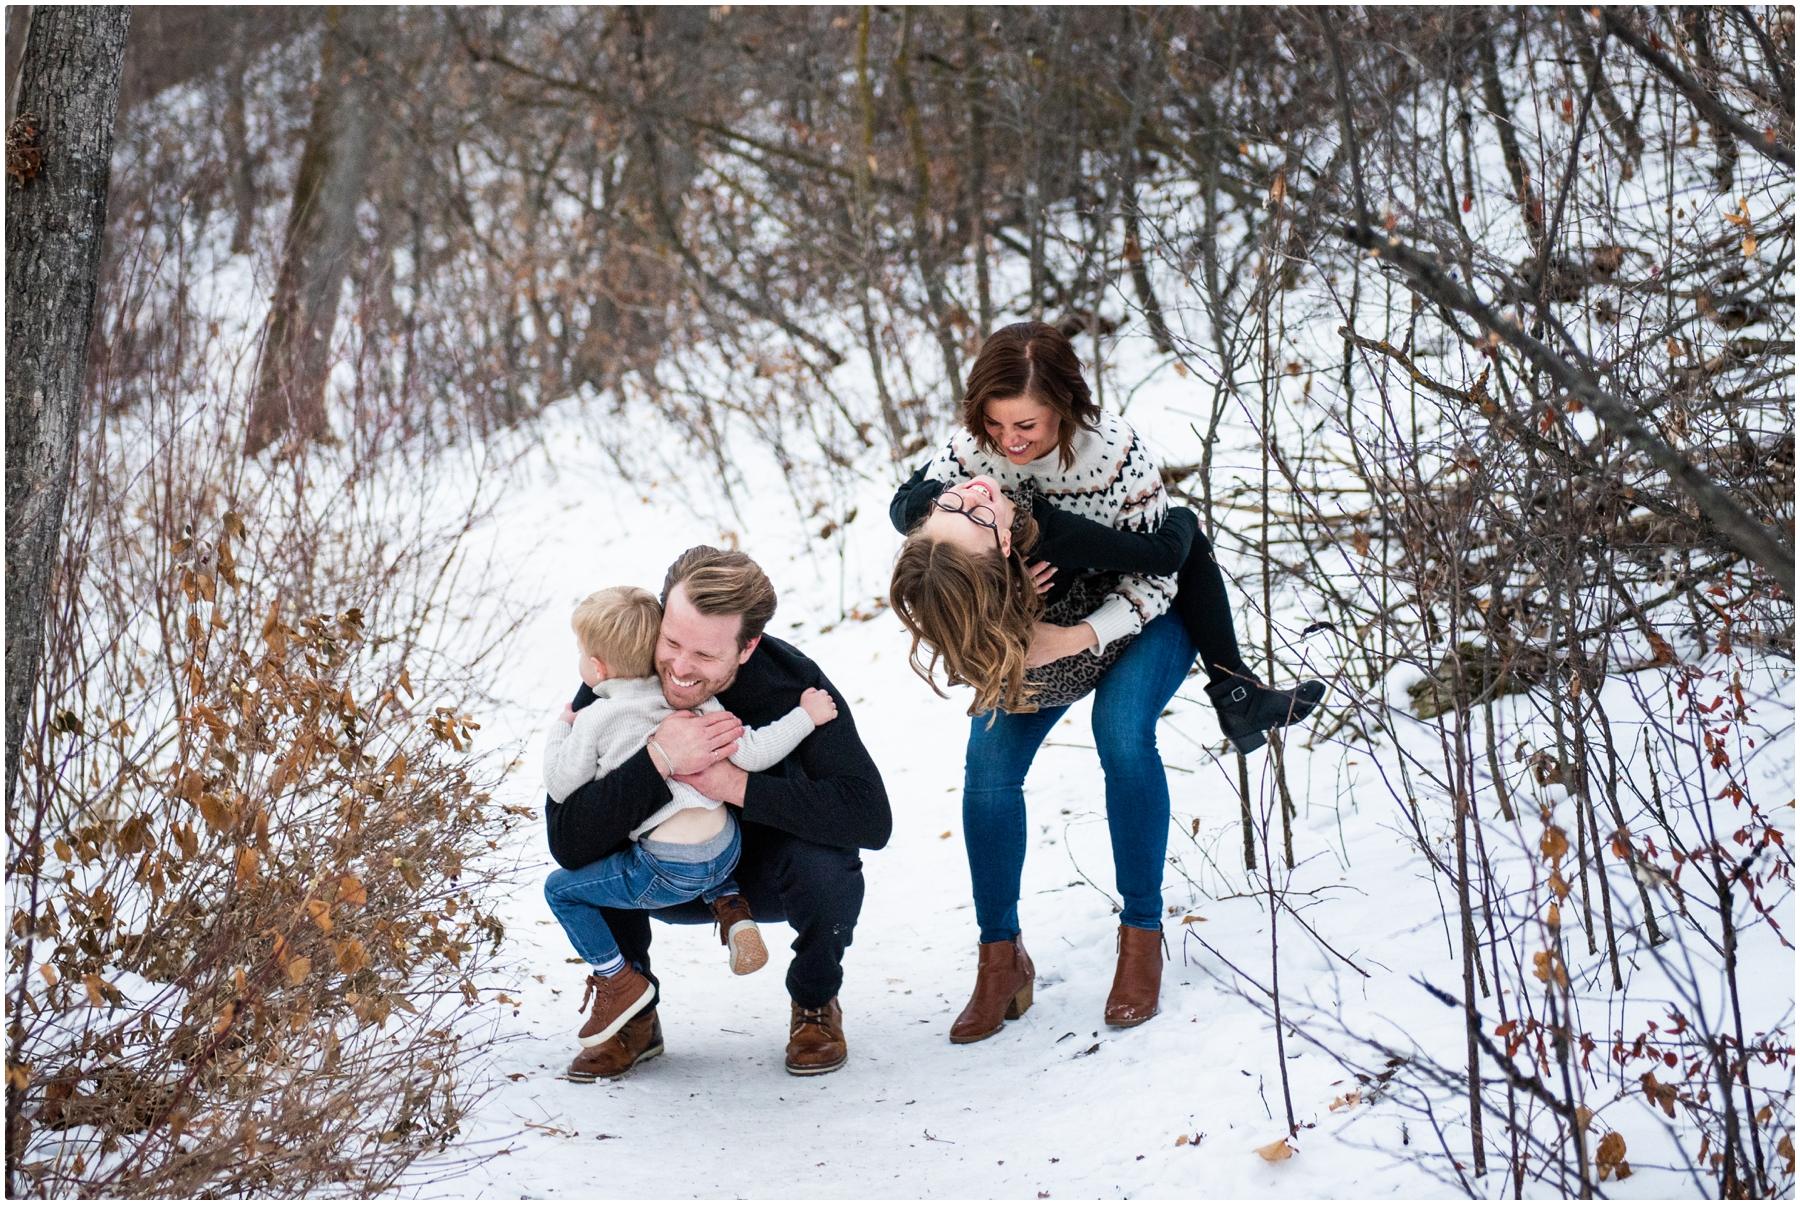 Edworthy Park Winter Calgary Family PhotographyEdworthy Park Winter Calgary Family Photography